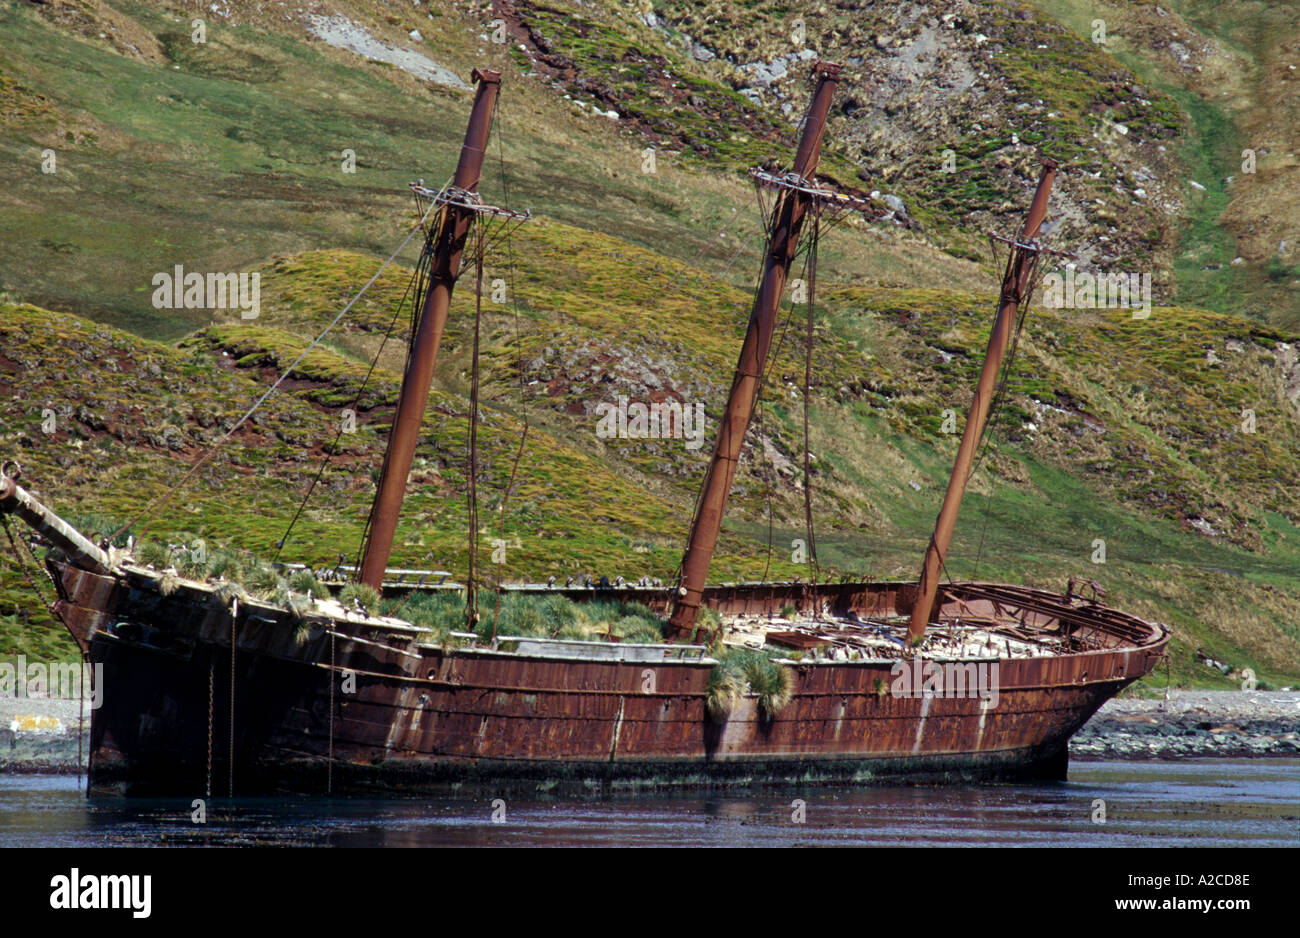 Abandoned whaling ship South Georgia - Stock Image